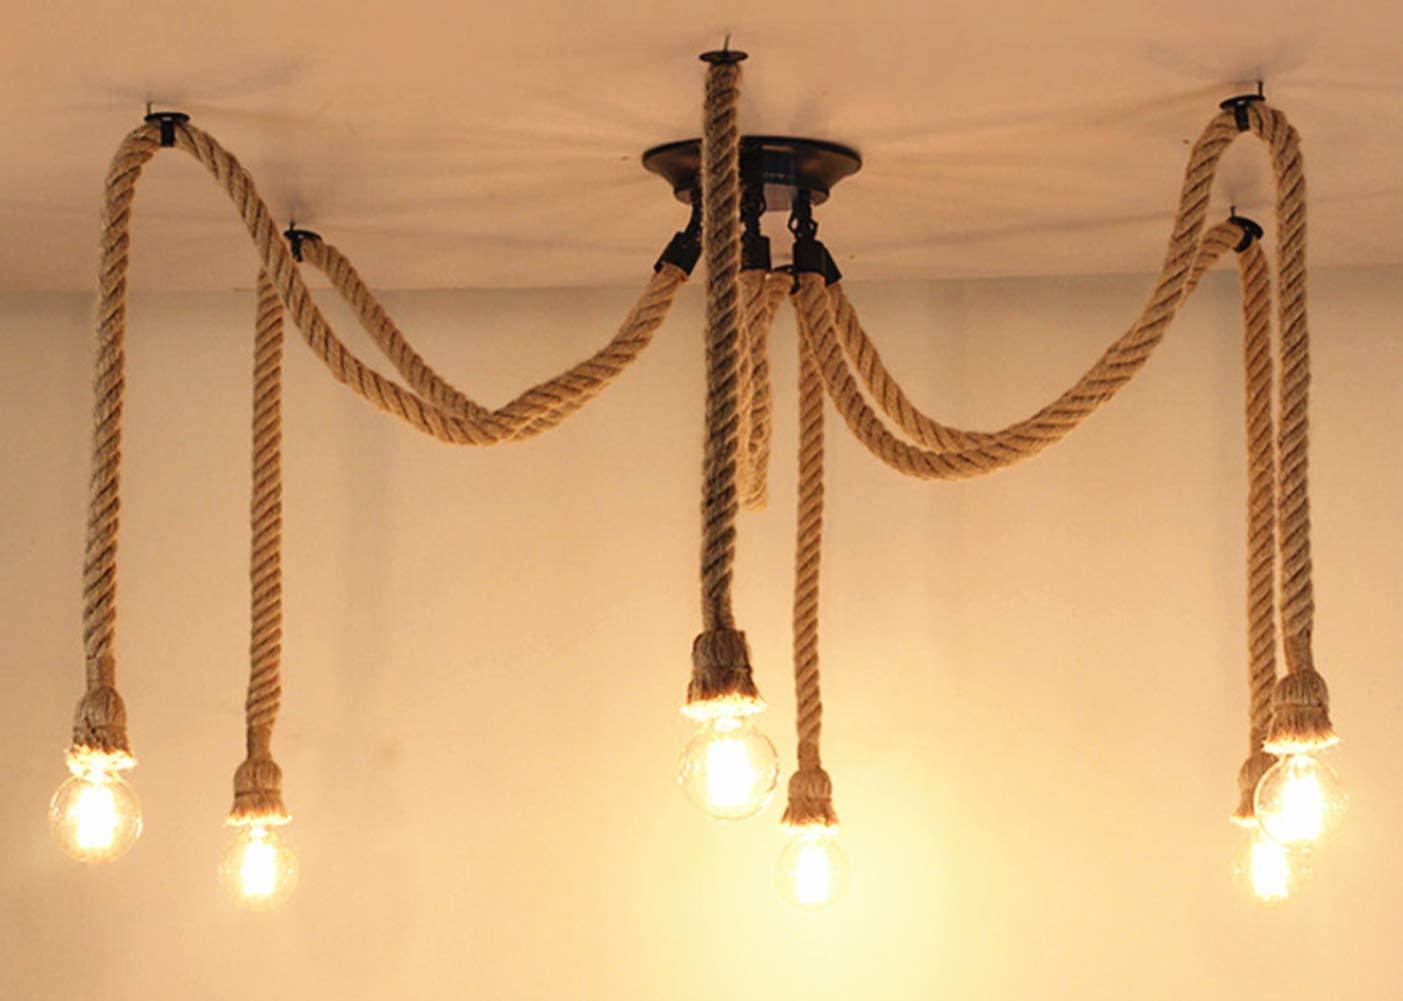 Pendant Light Hemp Rope Chandelier Vintage Ceiling Light Industrial Iron Metal Ceiling Lamp Edison E27 Loft Retro Style 6 Heads